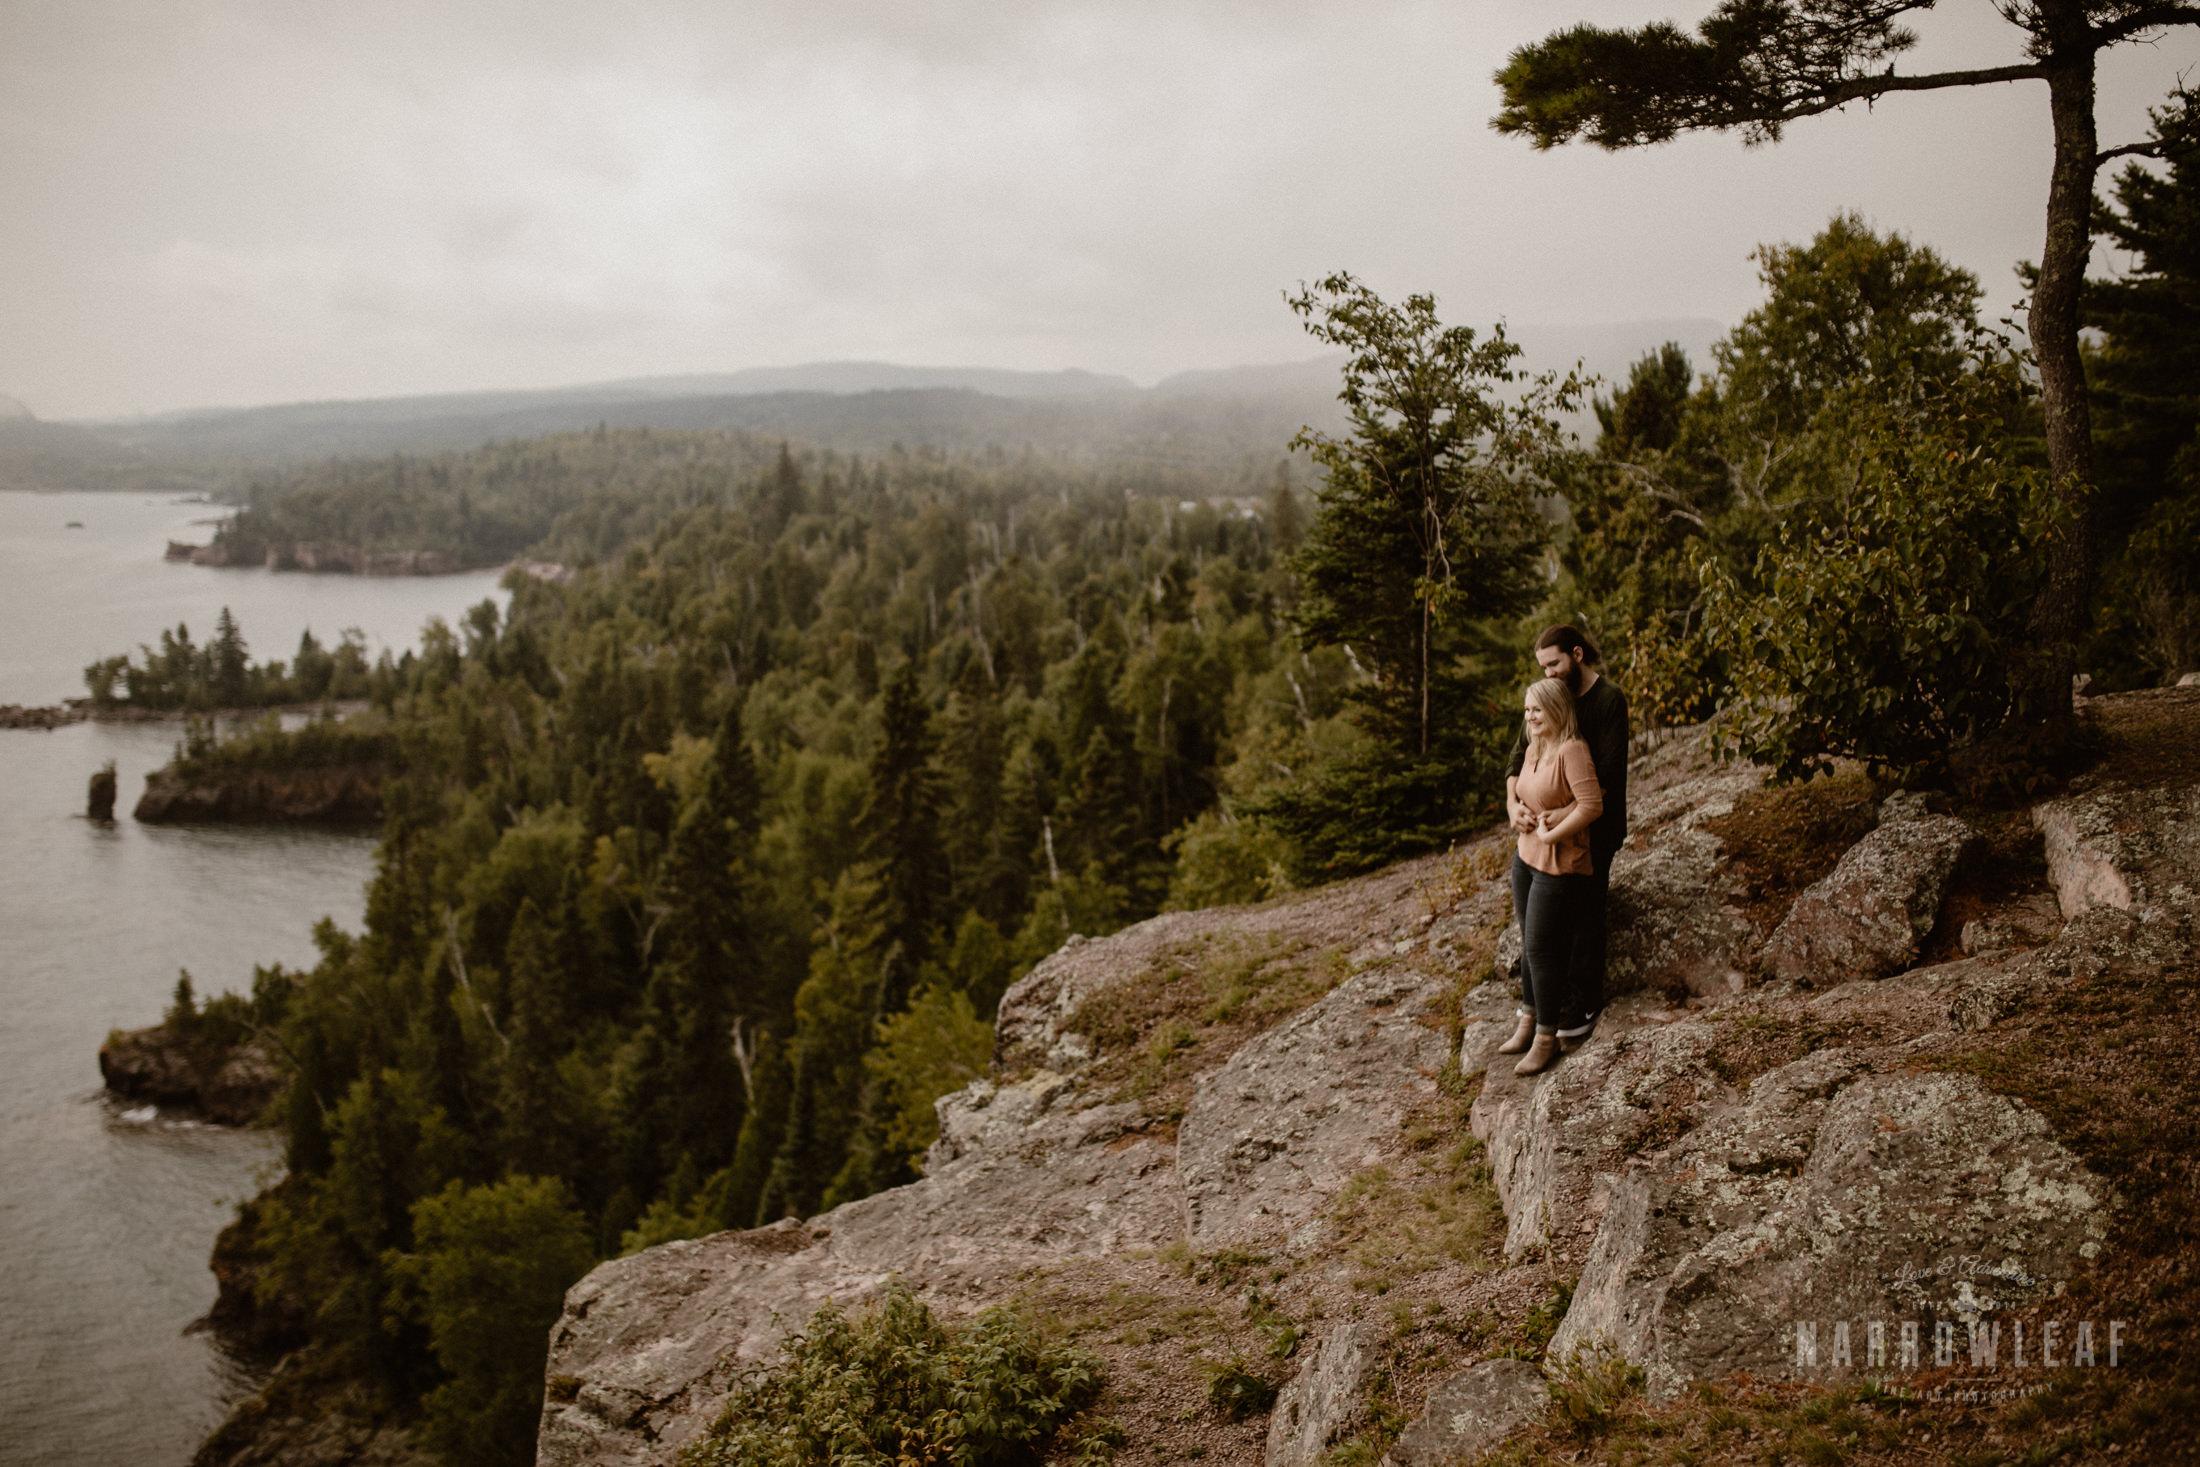 Minnesota-Hiking-Engagement-Photographer-Narrowleaf_Love_and_Adventure_Photography-Tettegouche-State-Park-6189.jpg